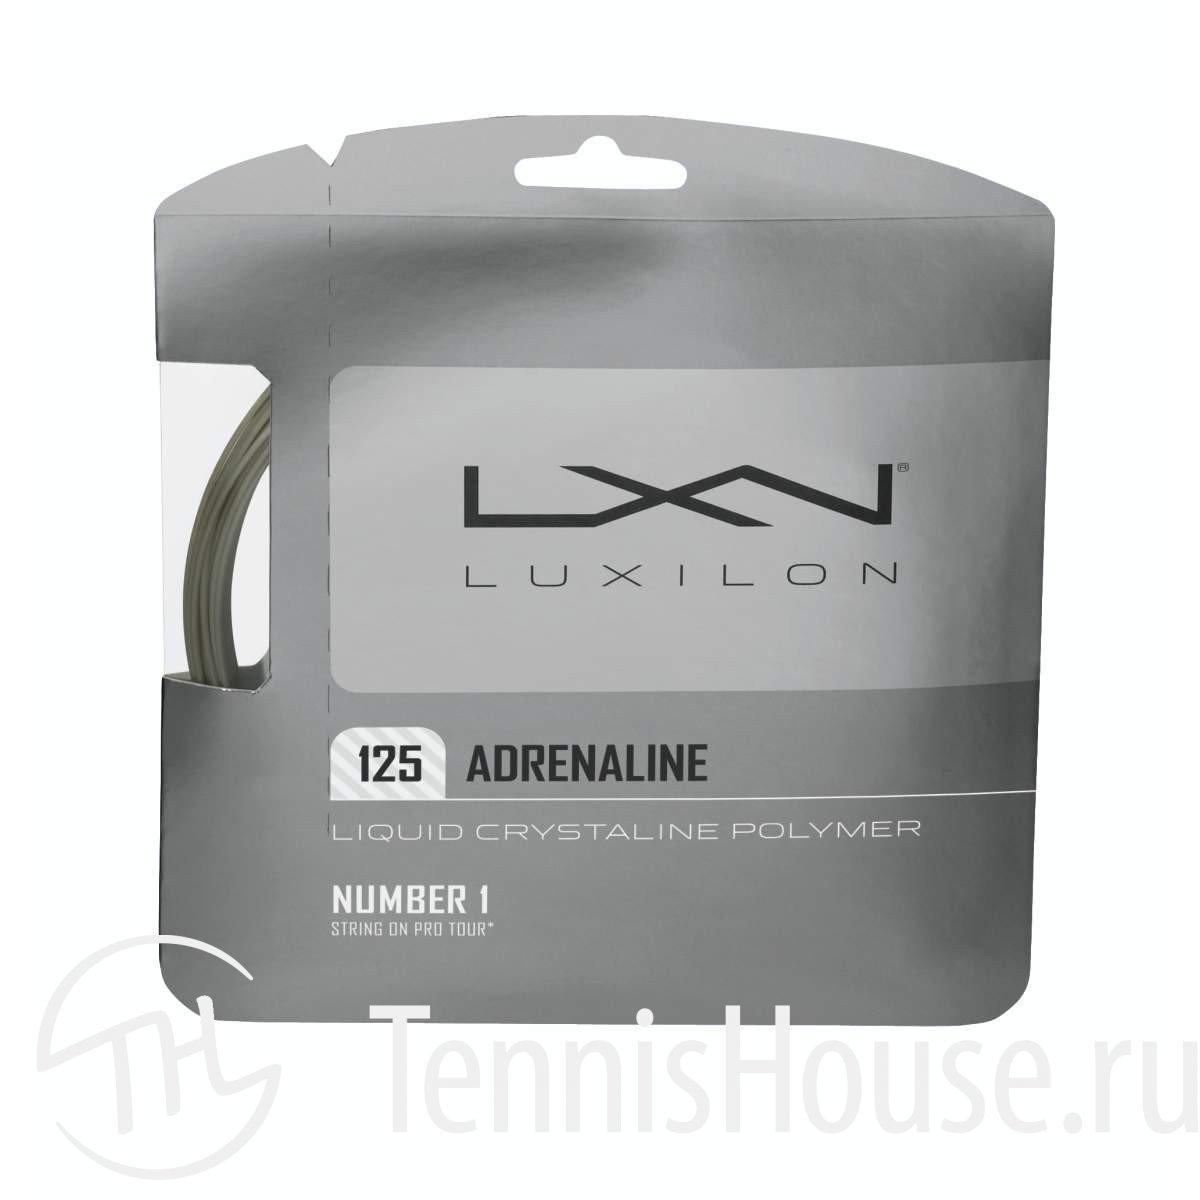 Luxilon Adrenaline 1.25 WRZ993800